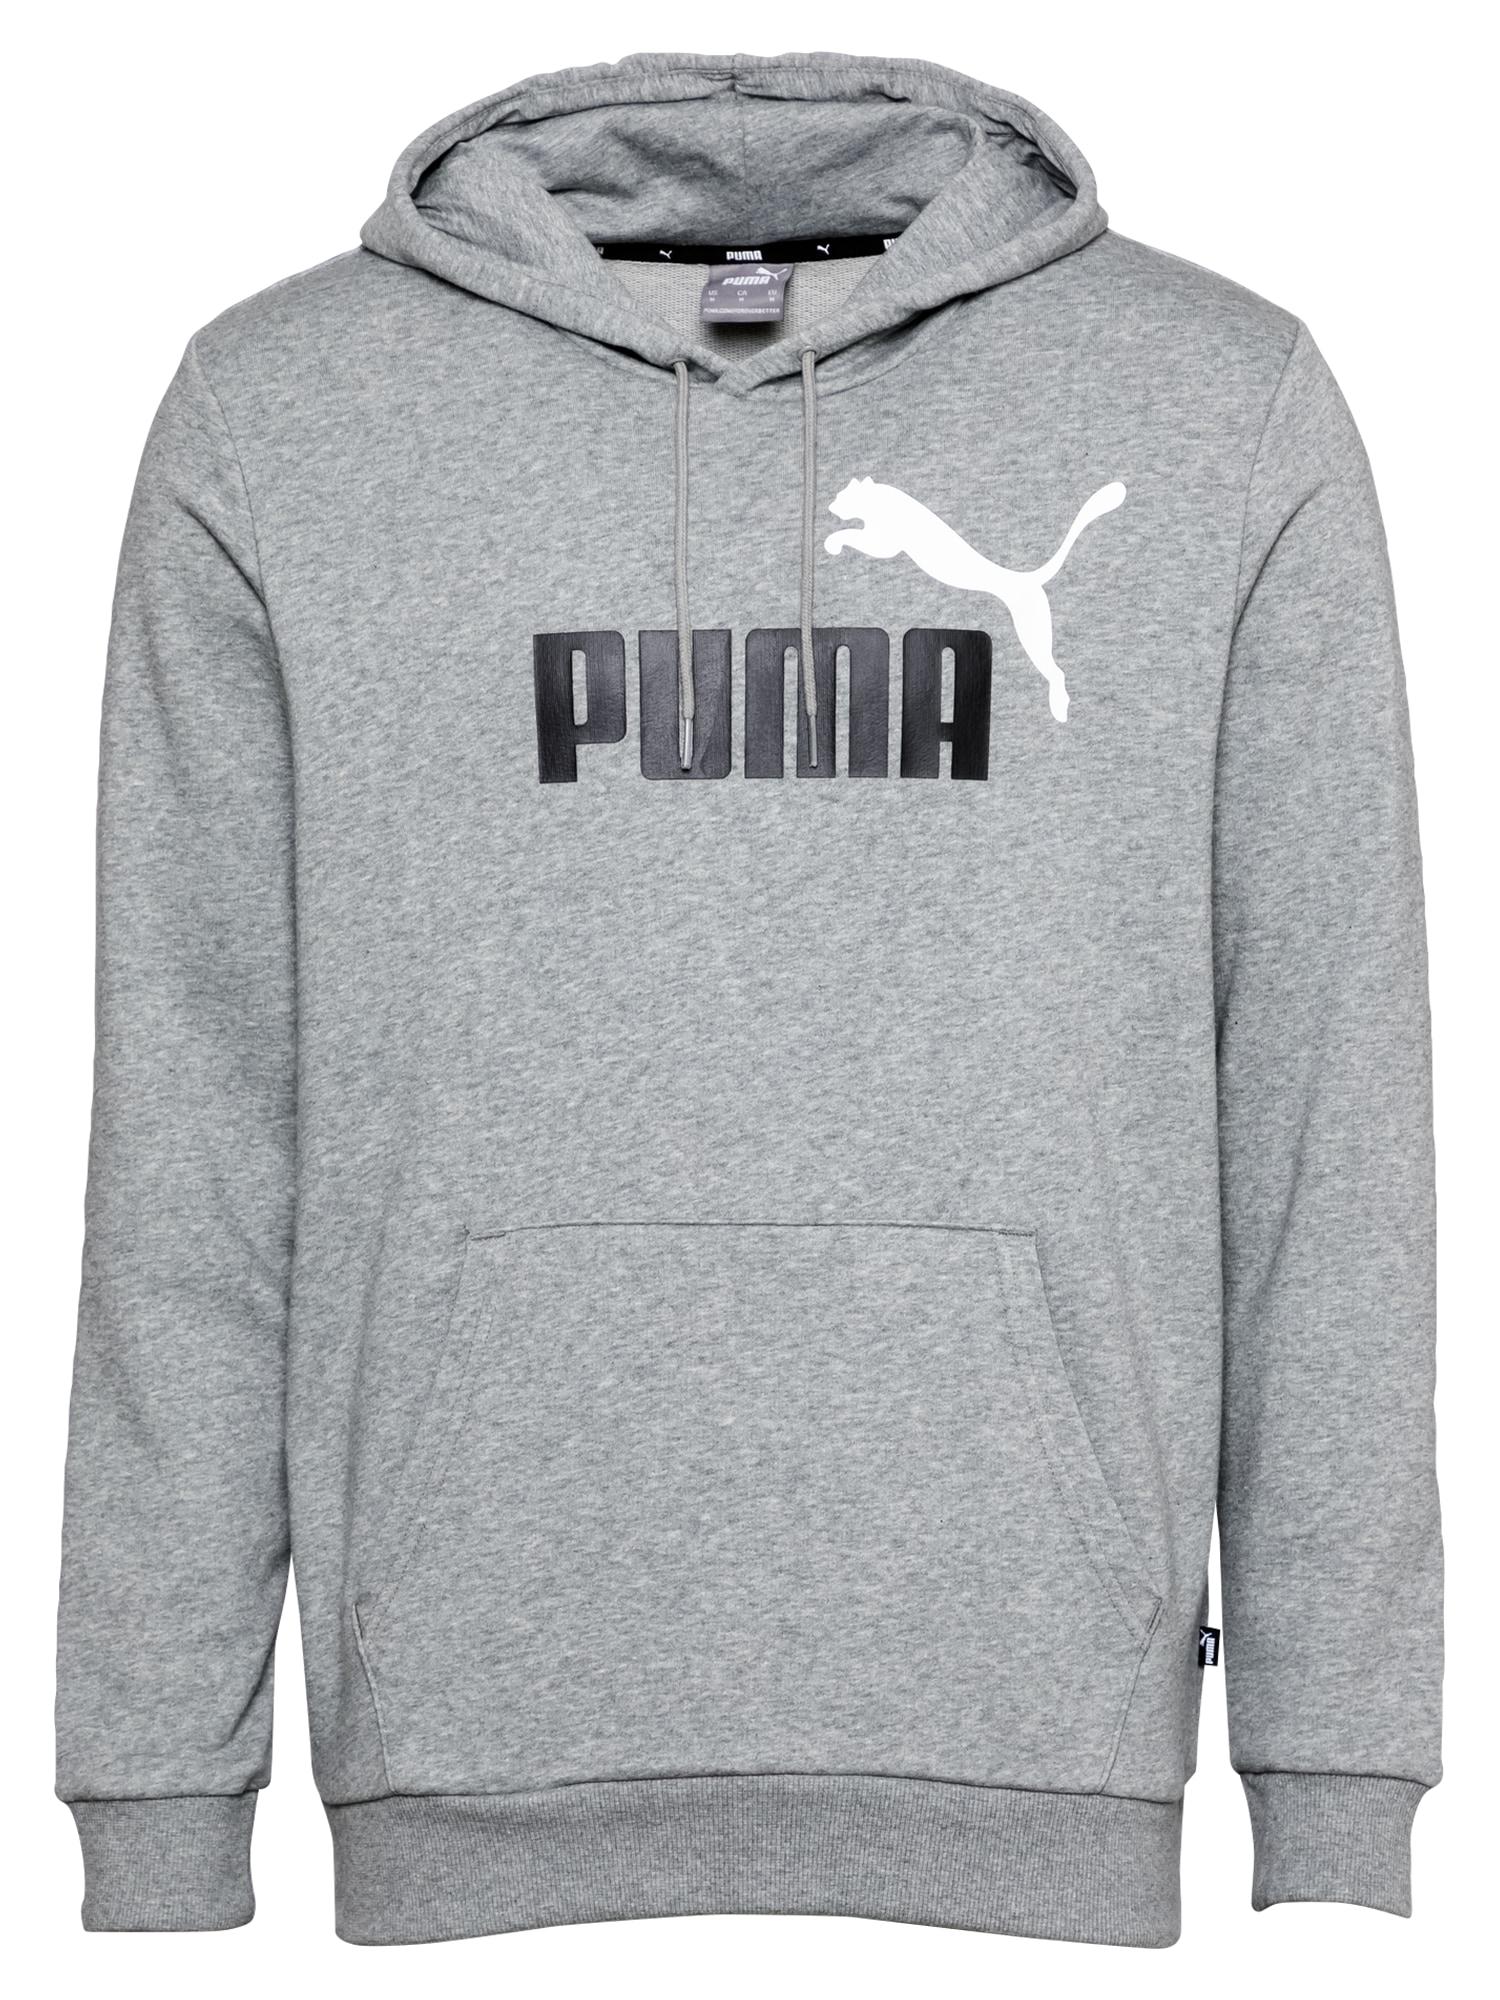 PUMA Sportinio tipo megztinis margai pilka / balta / juoda